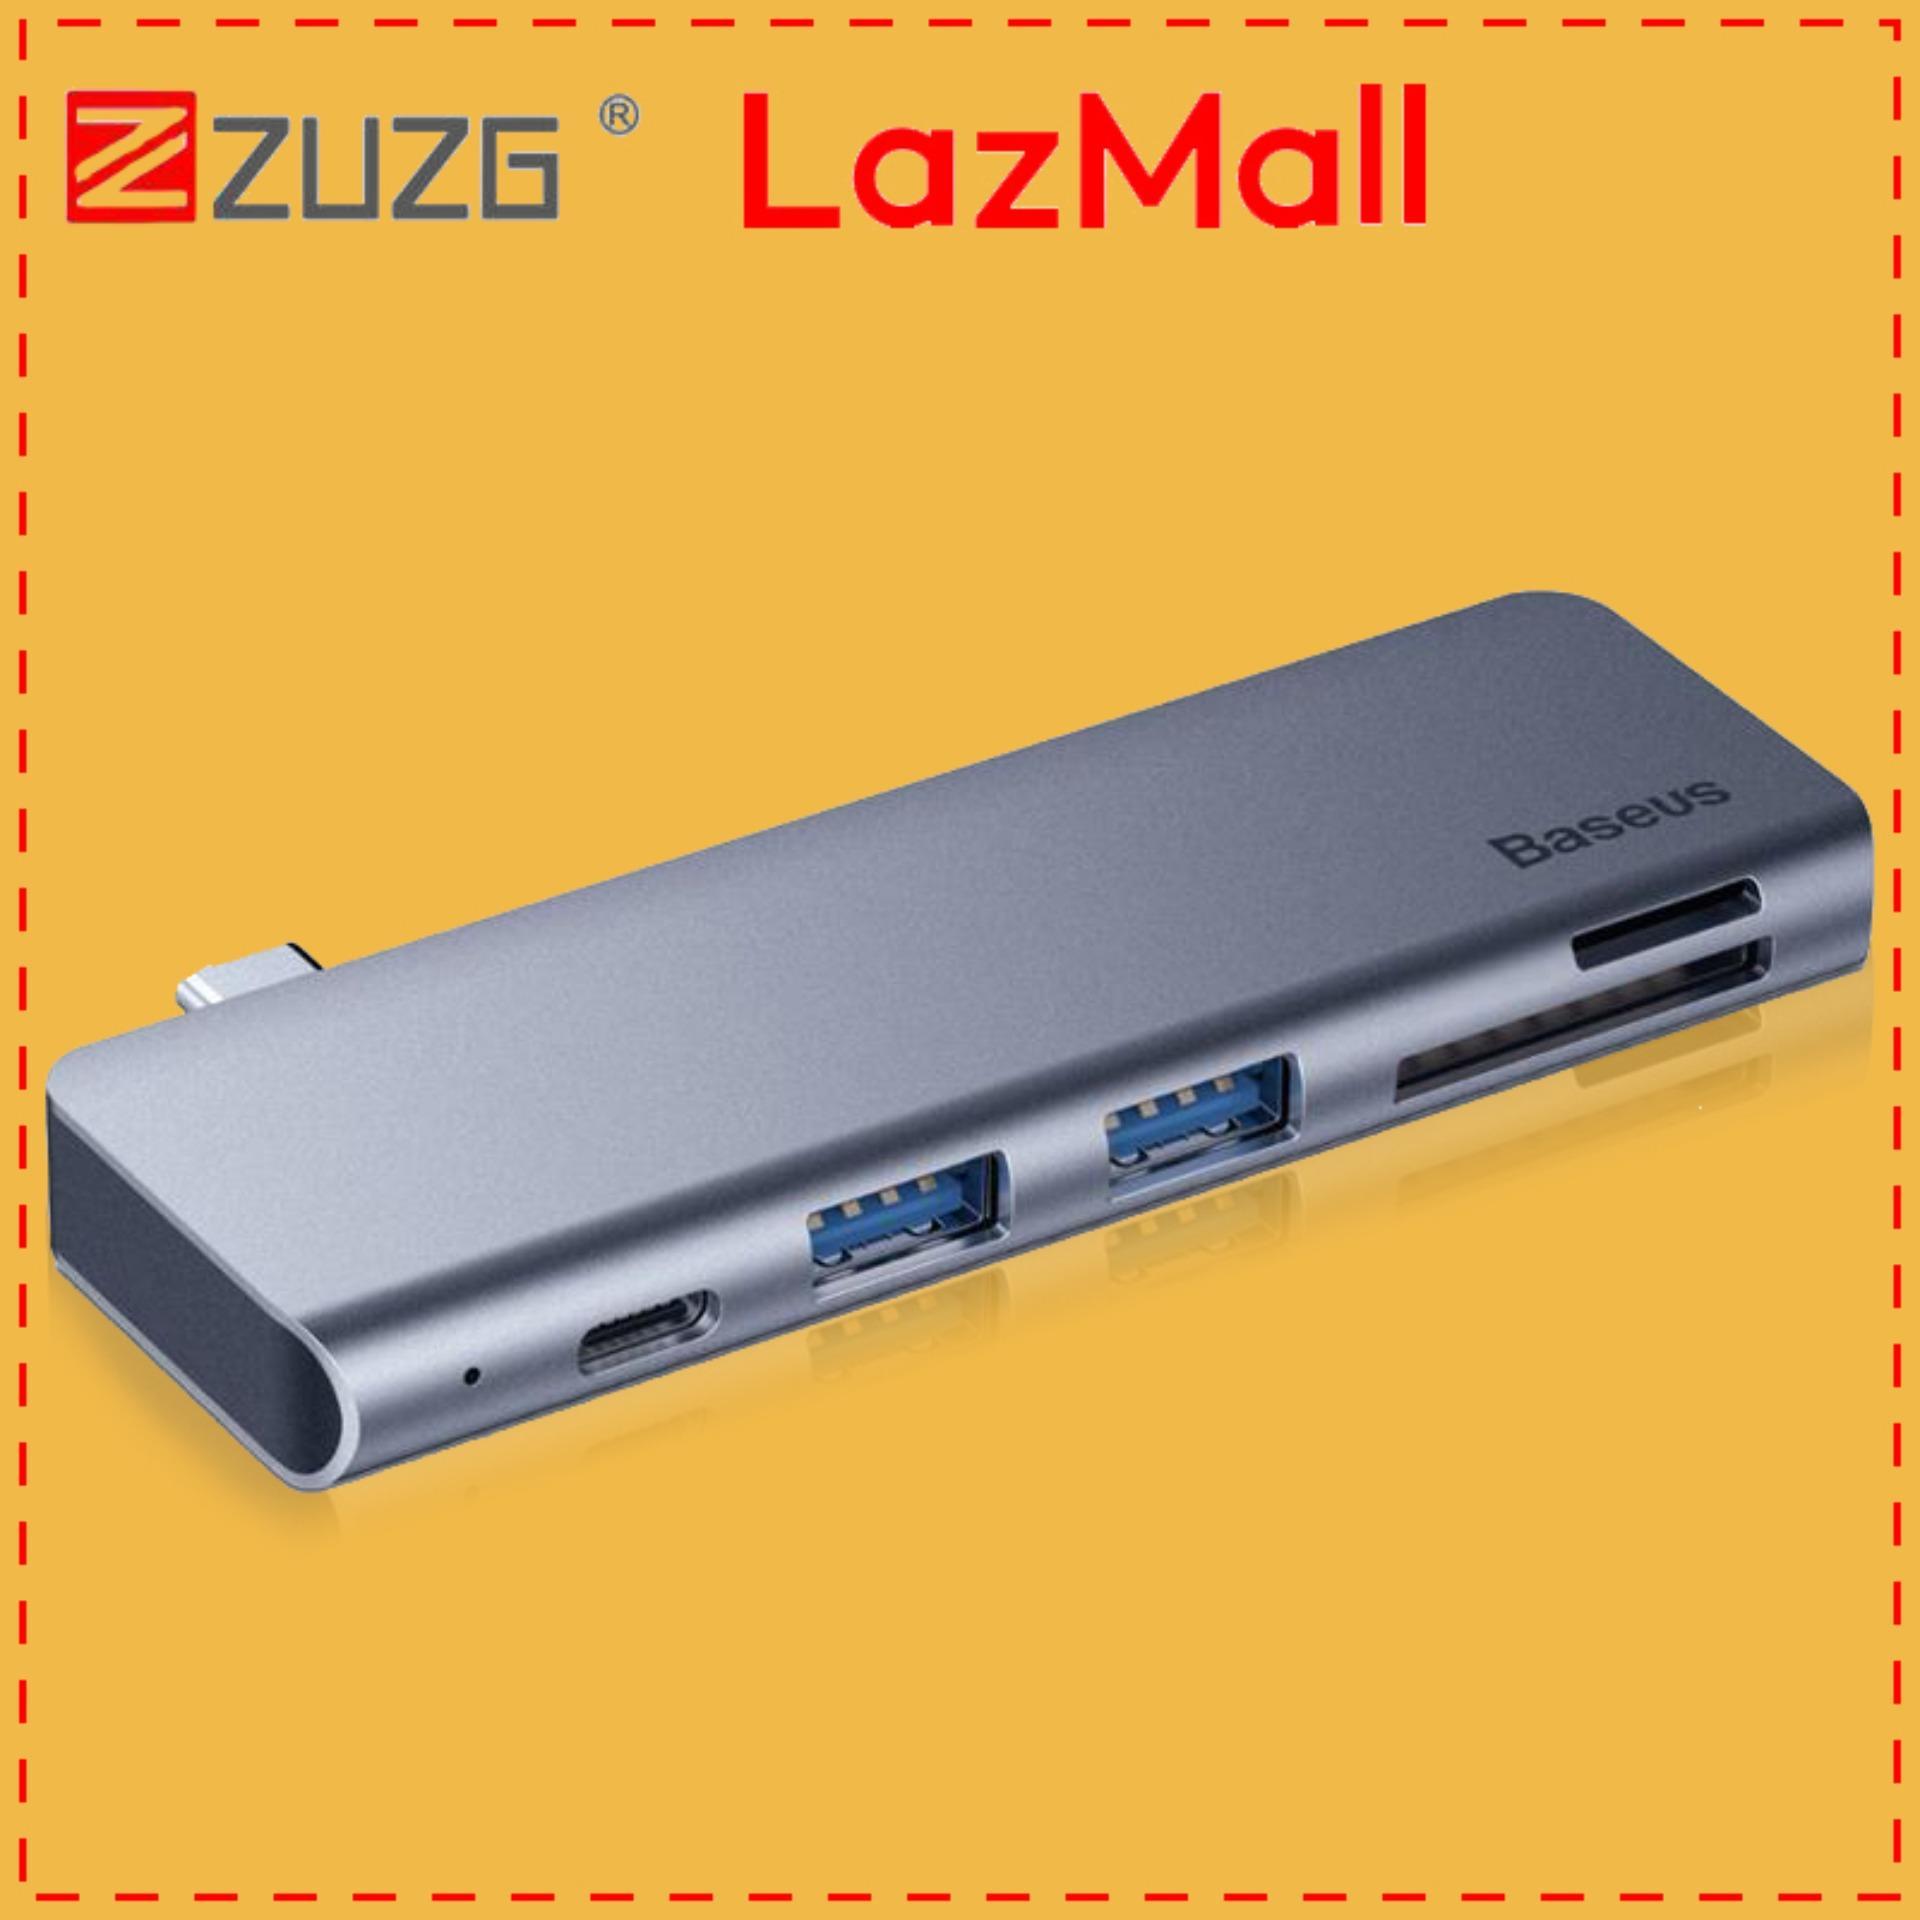 [ZUZG] USB C HUB Type-c to Multi Ports USB 3.0 USB3.0 Type C Power Adapter USB-C HUB Splitter Dock For Macbook Pro Air USBC HAB